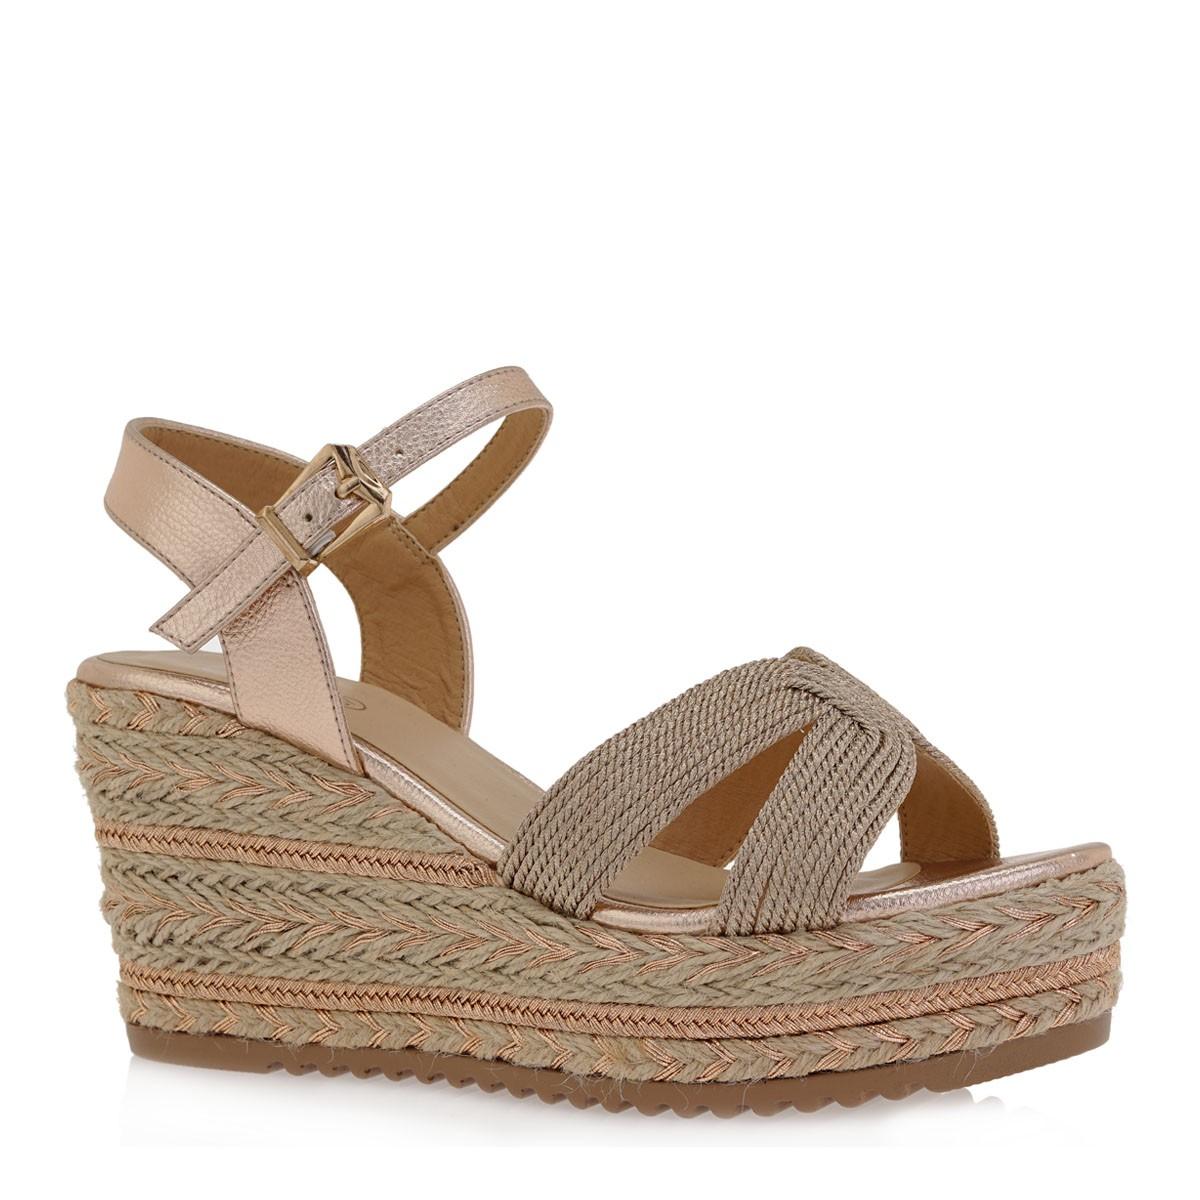 EXE Shoes Γυναικεία Πέδιλα Πλατφόρμες 220 Ροζ Χρυσό K468Q220762F